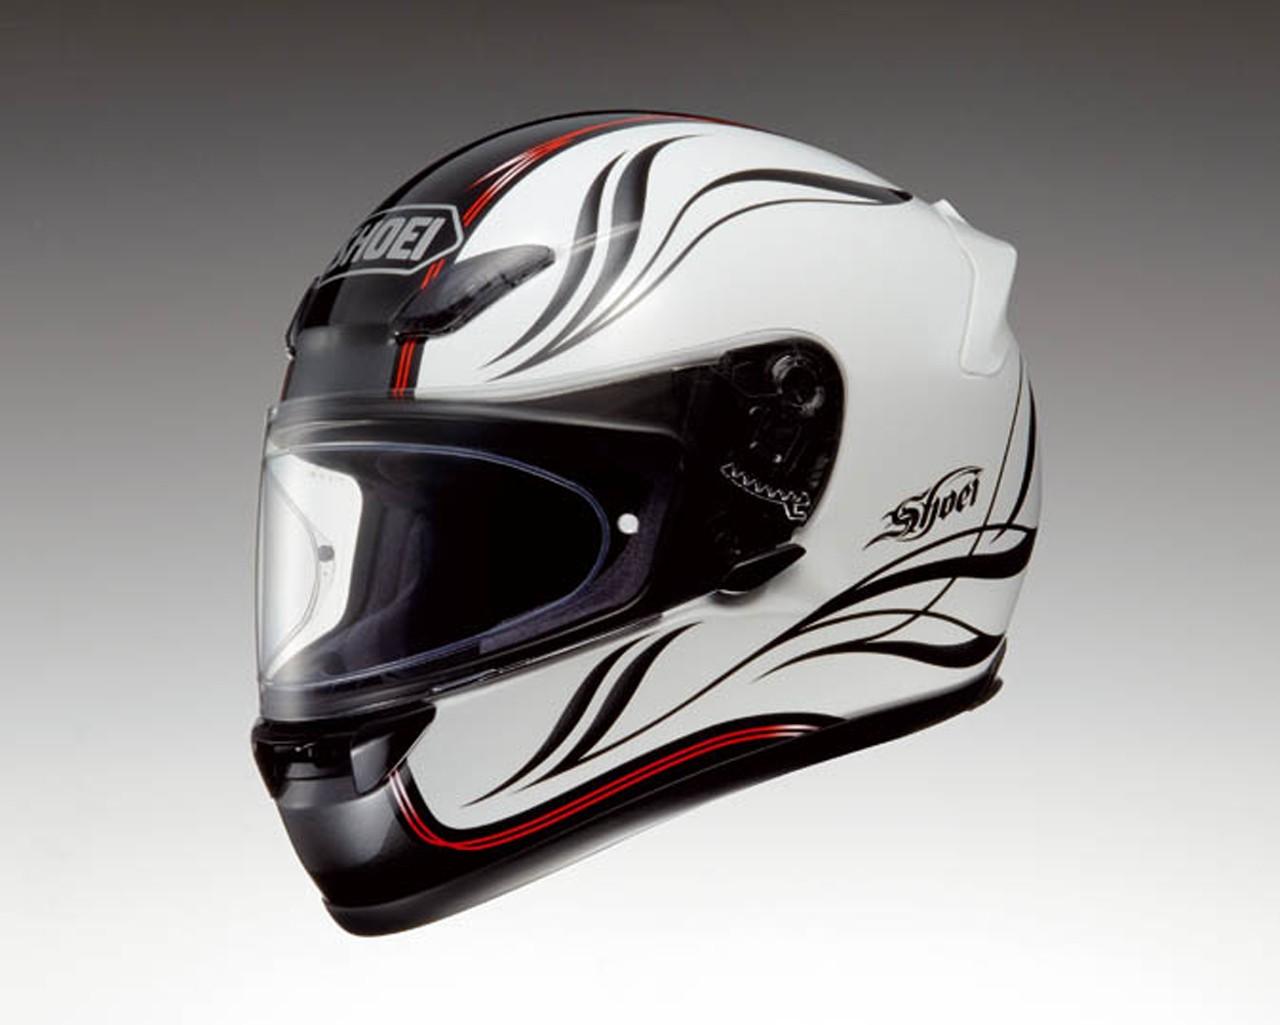 Casque moto shoei xr 1000